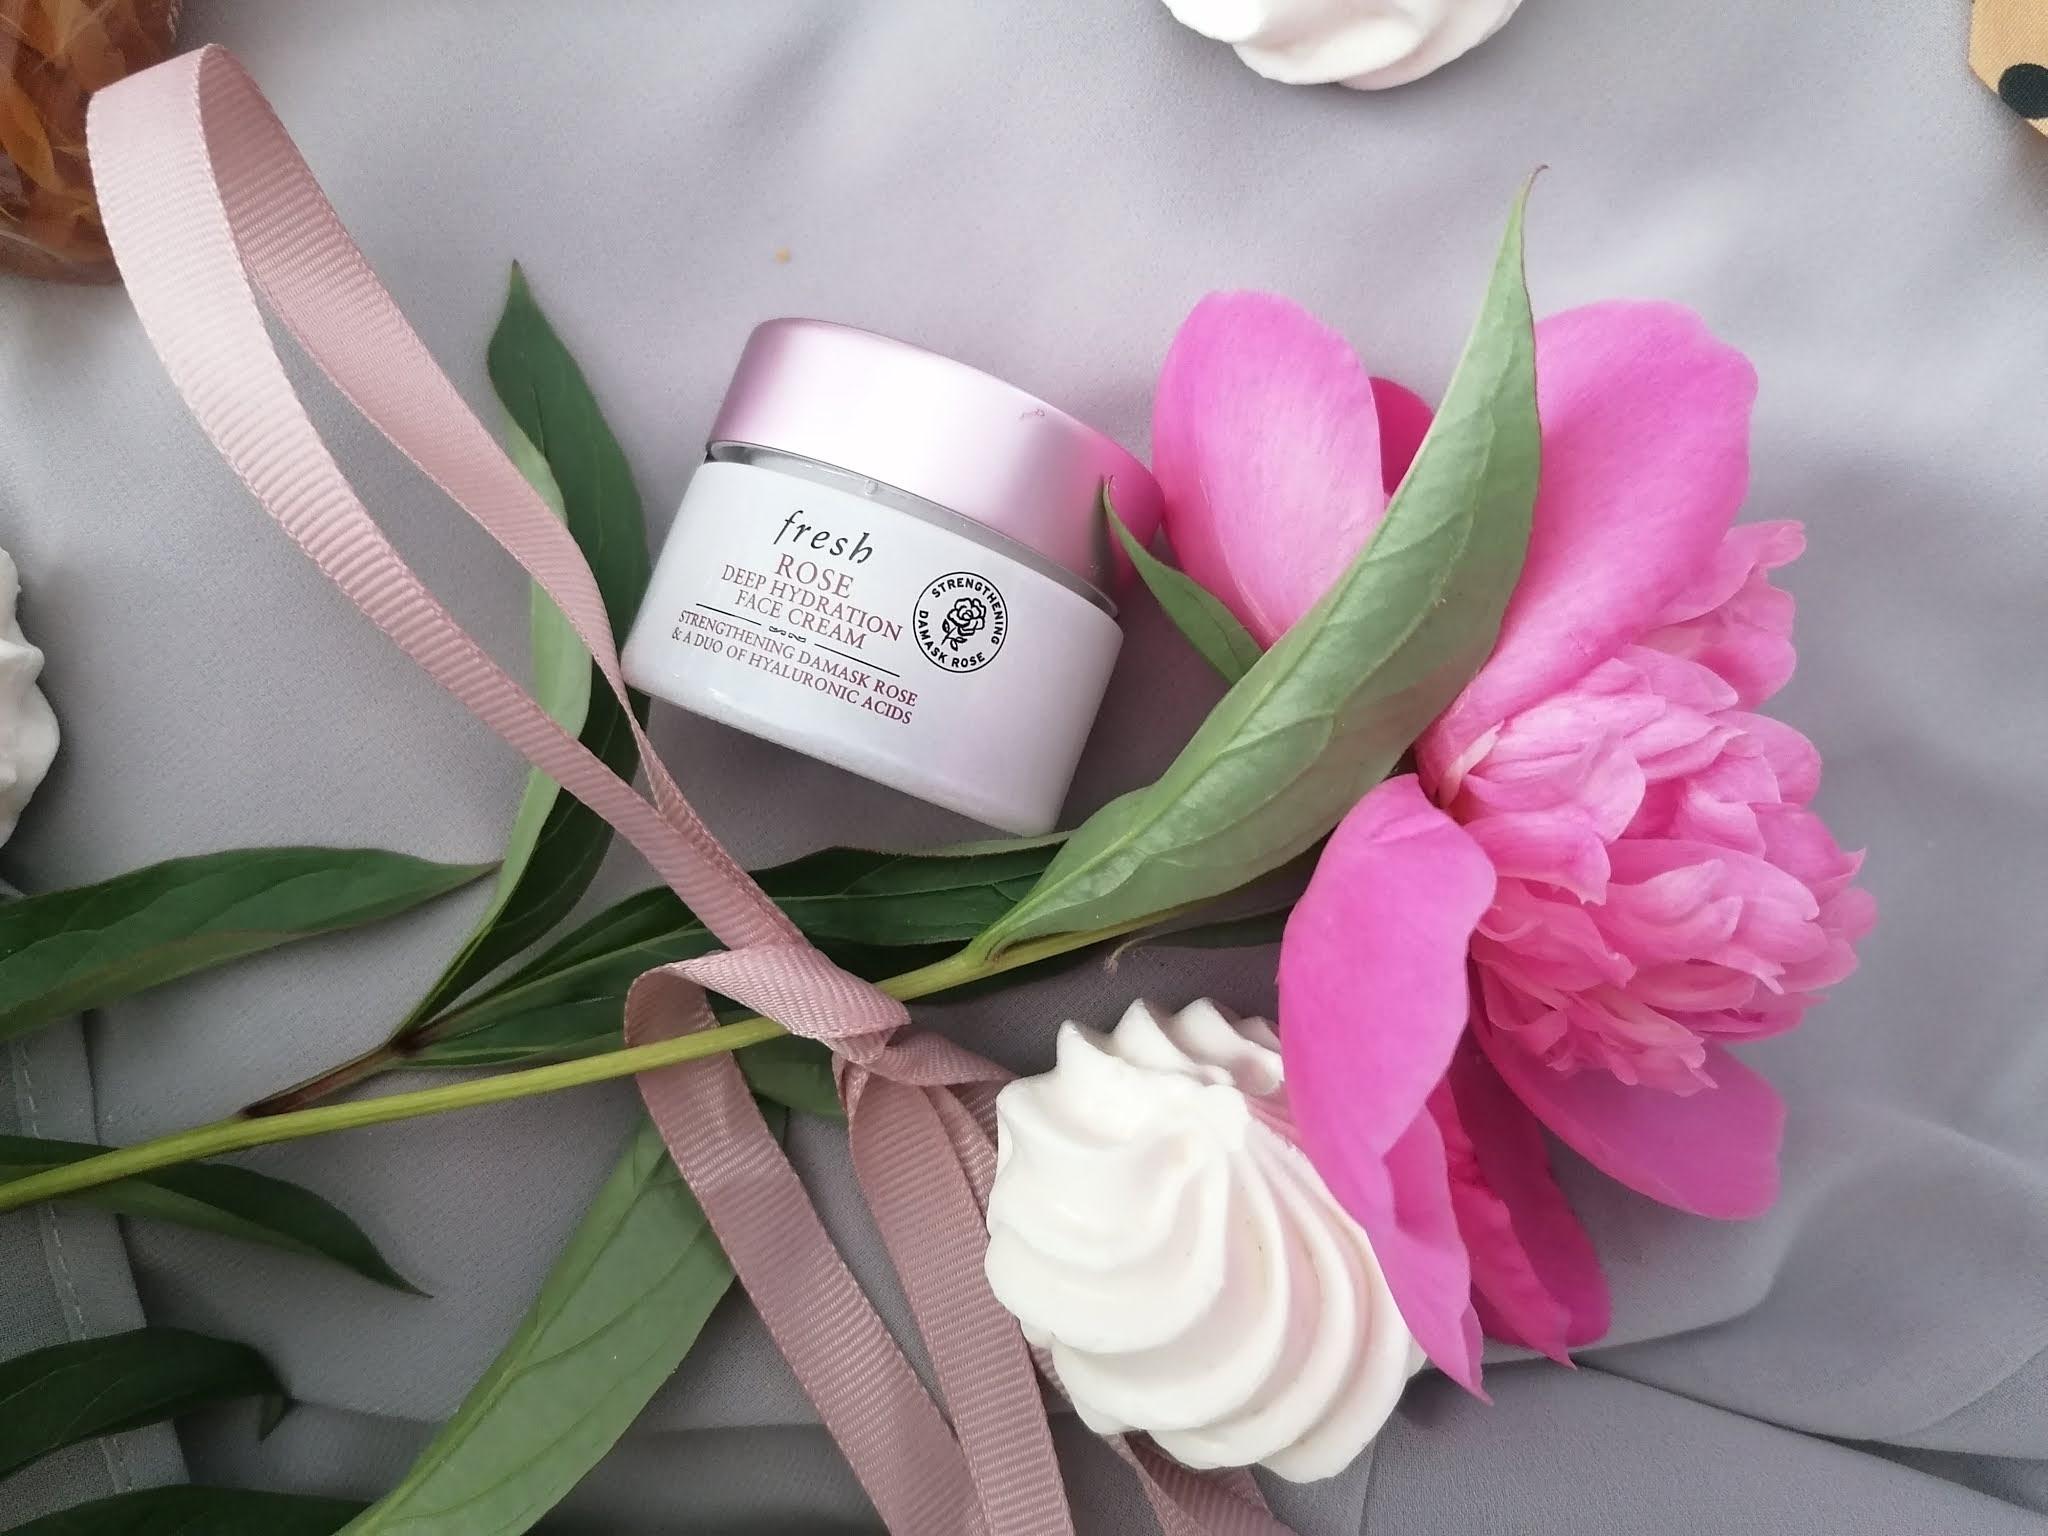 Rose Deep Hydration Face Cream fresh